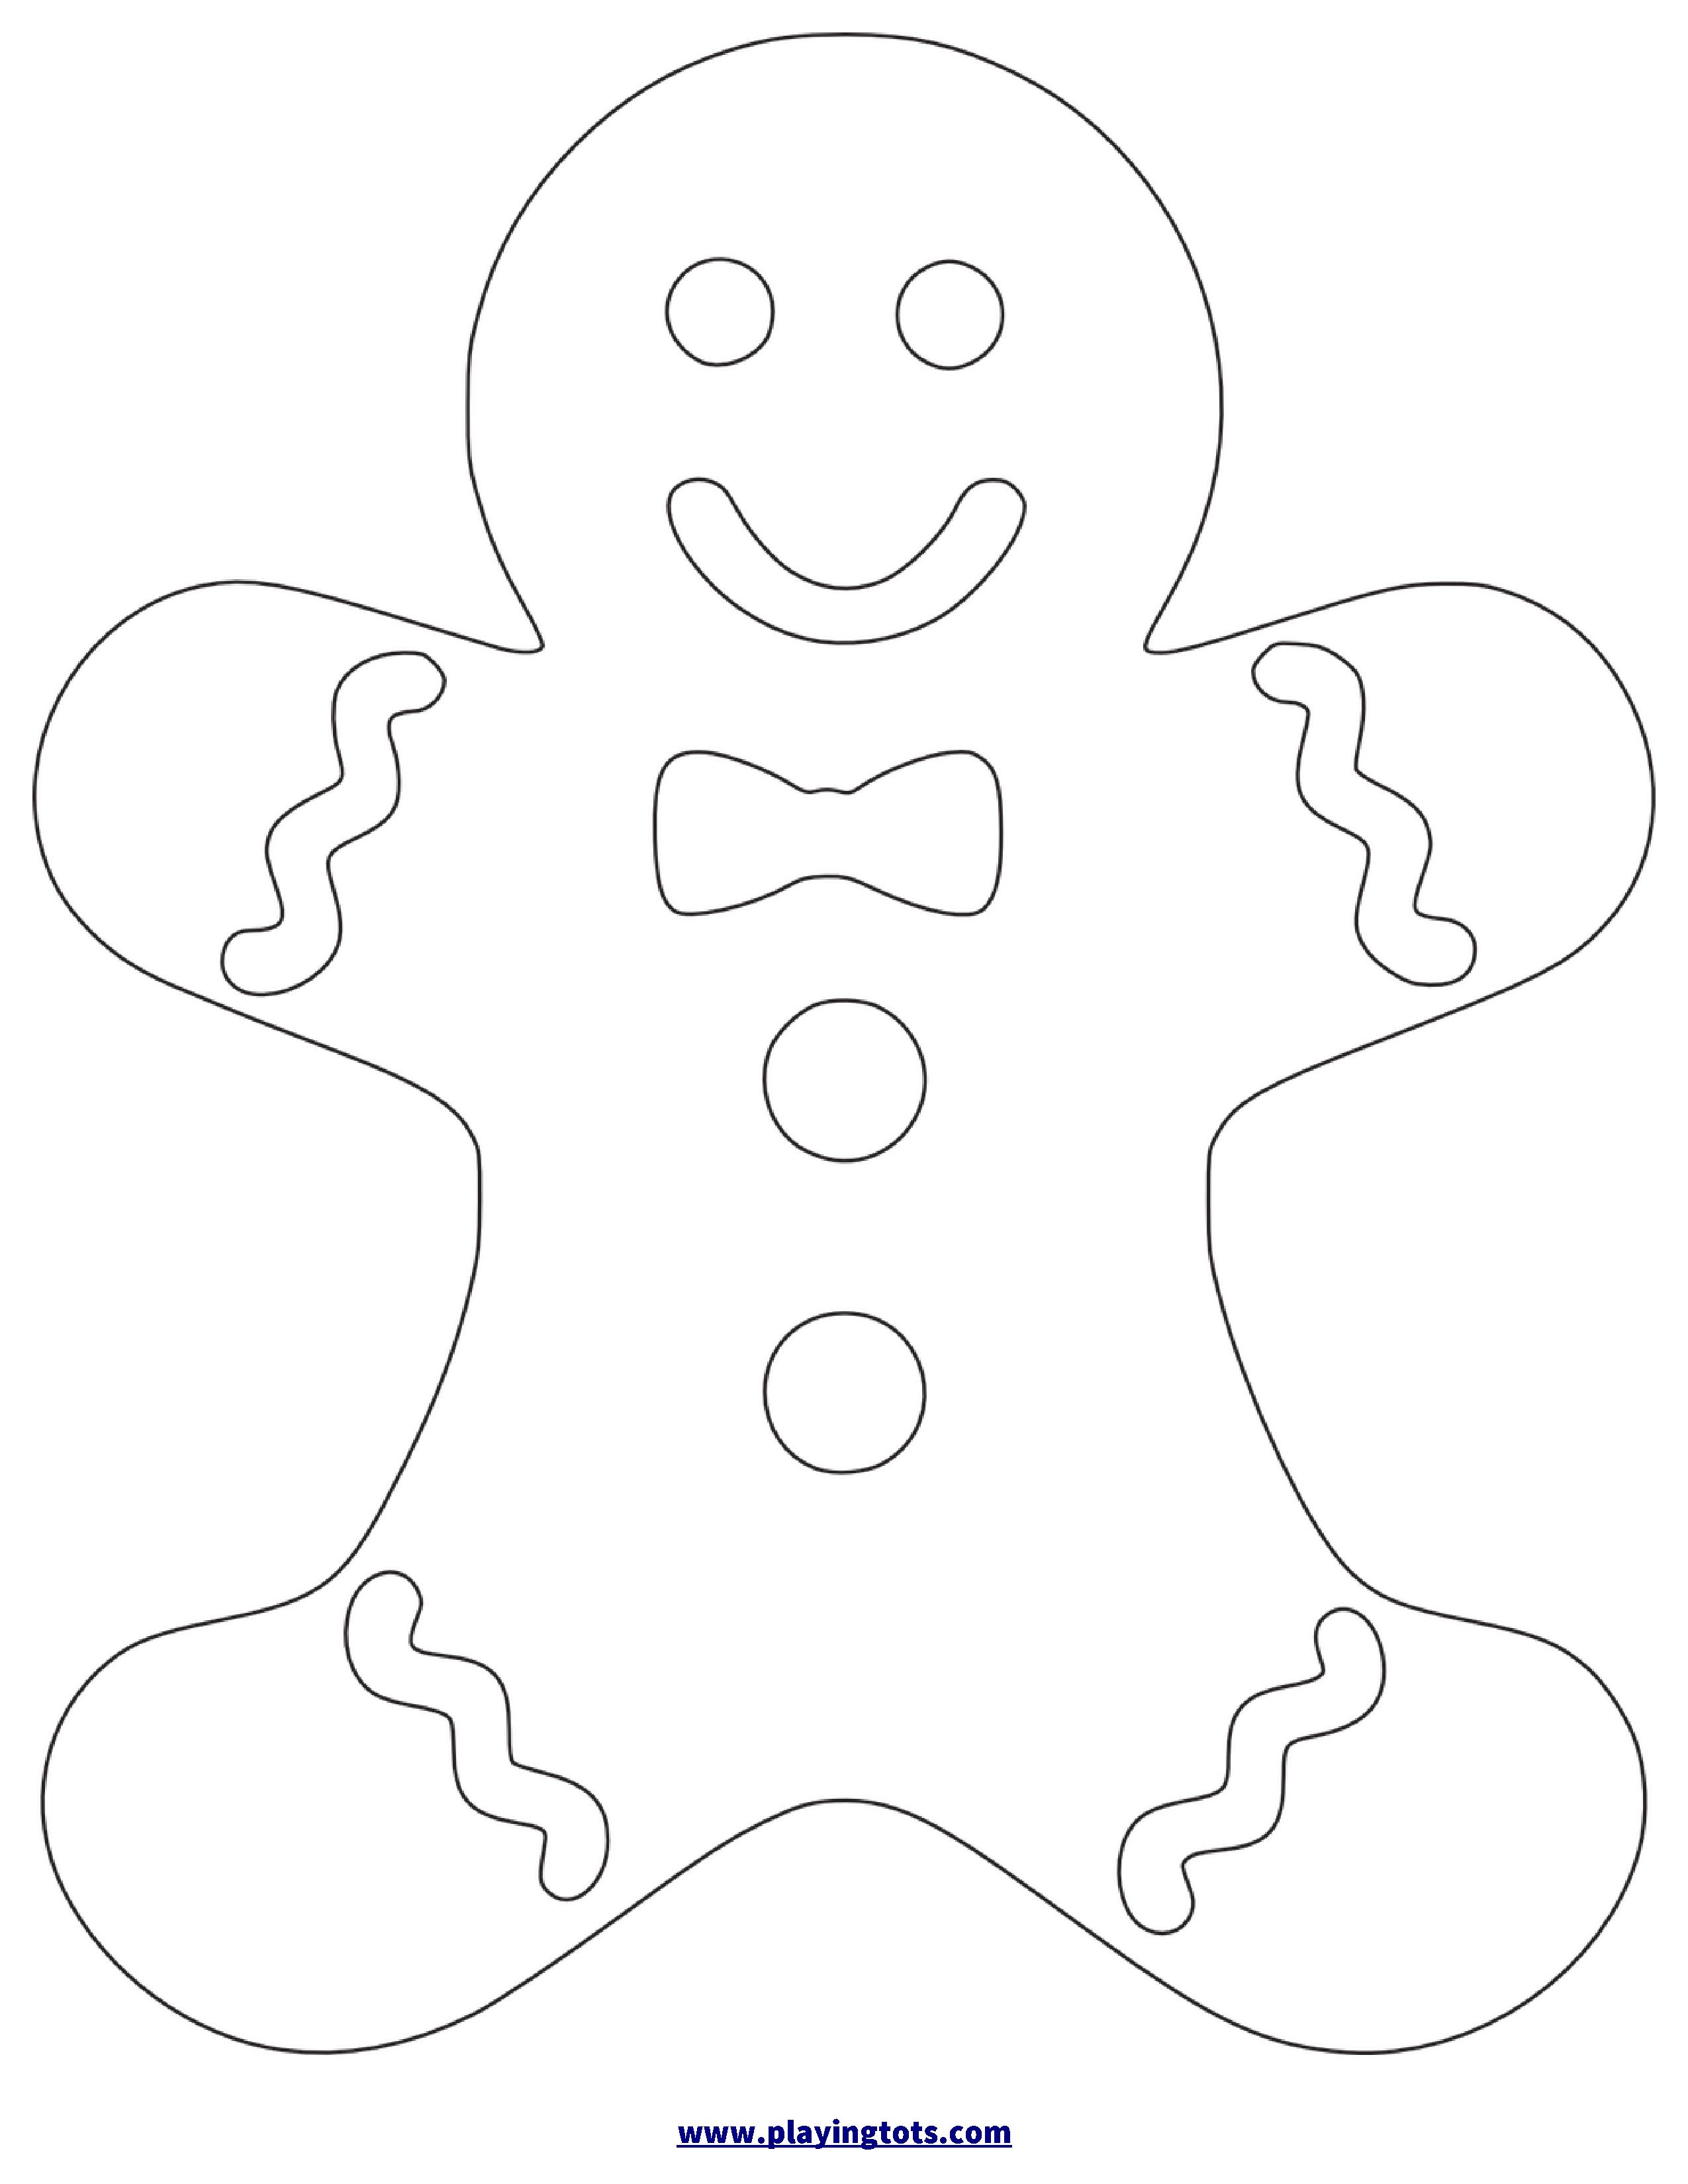 Free Printable Gingerbread Man Worksheet | Christmas Crafts - Gingerbread Template Free Printable